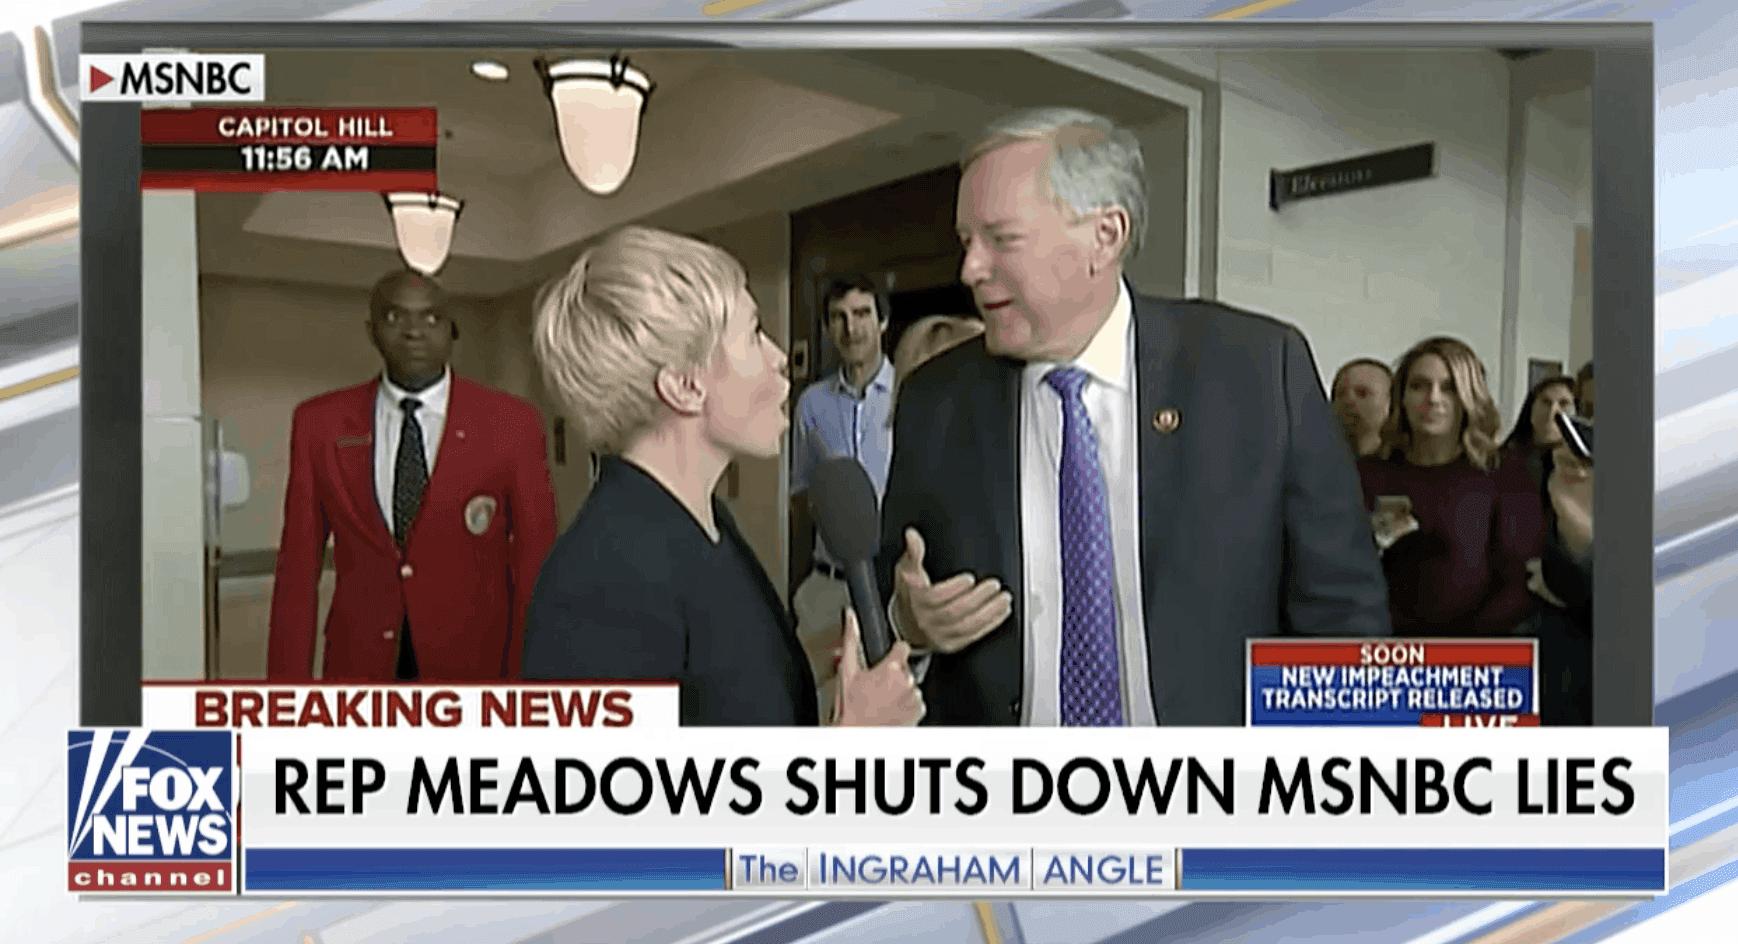 Rep. Mark Meadows shuts down MSNBC reporter on air 1